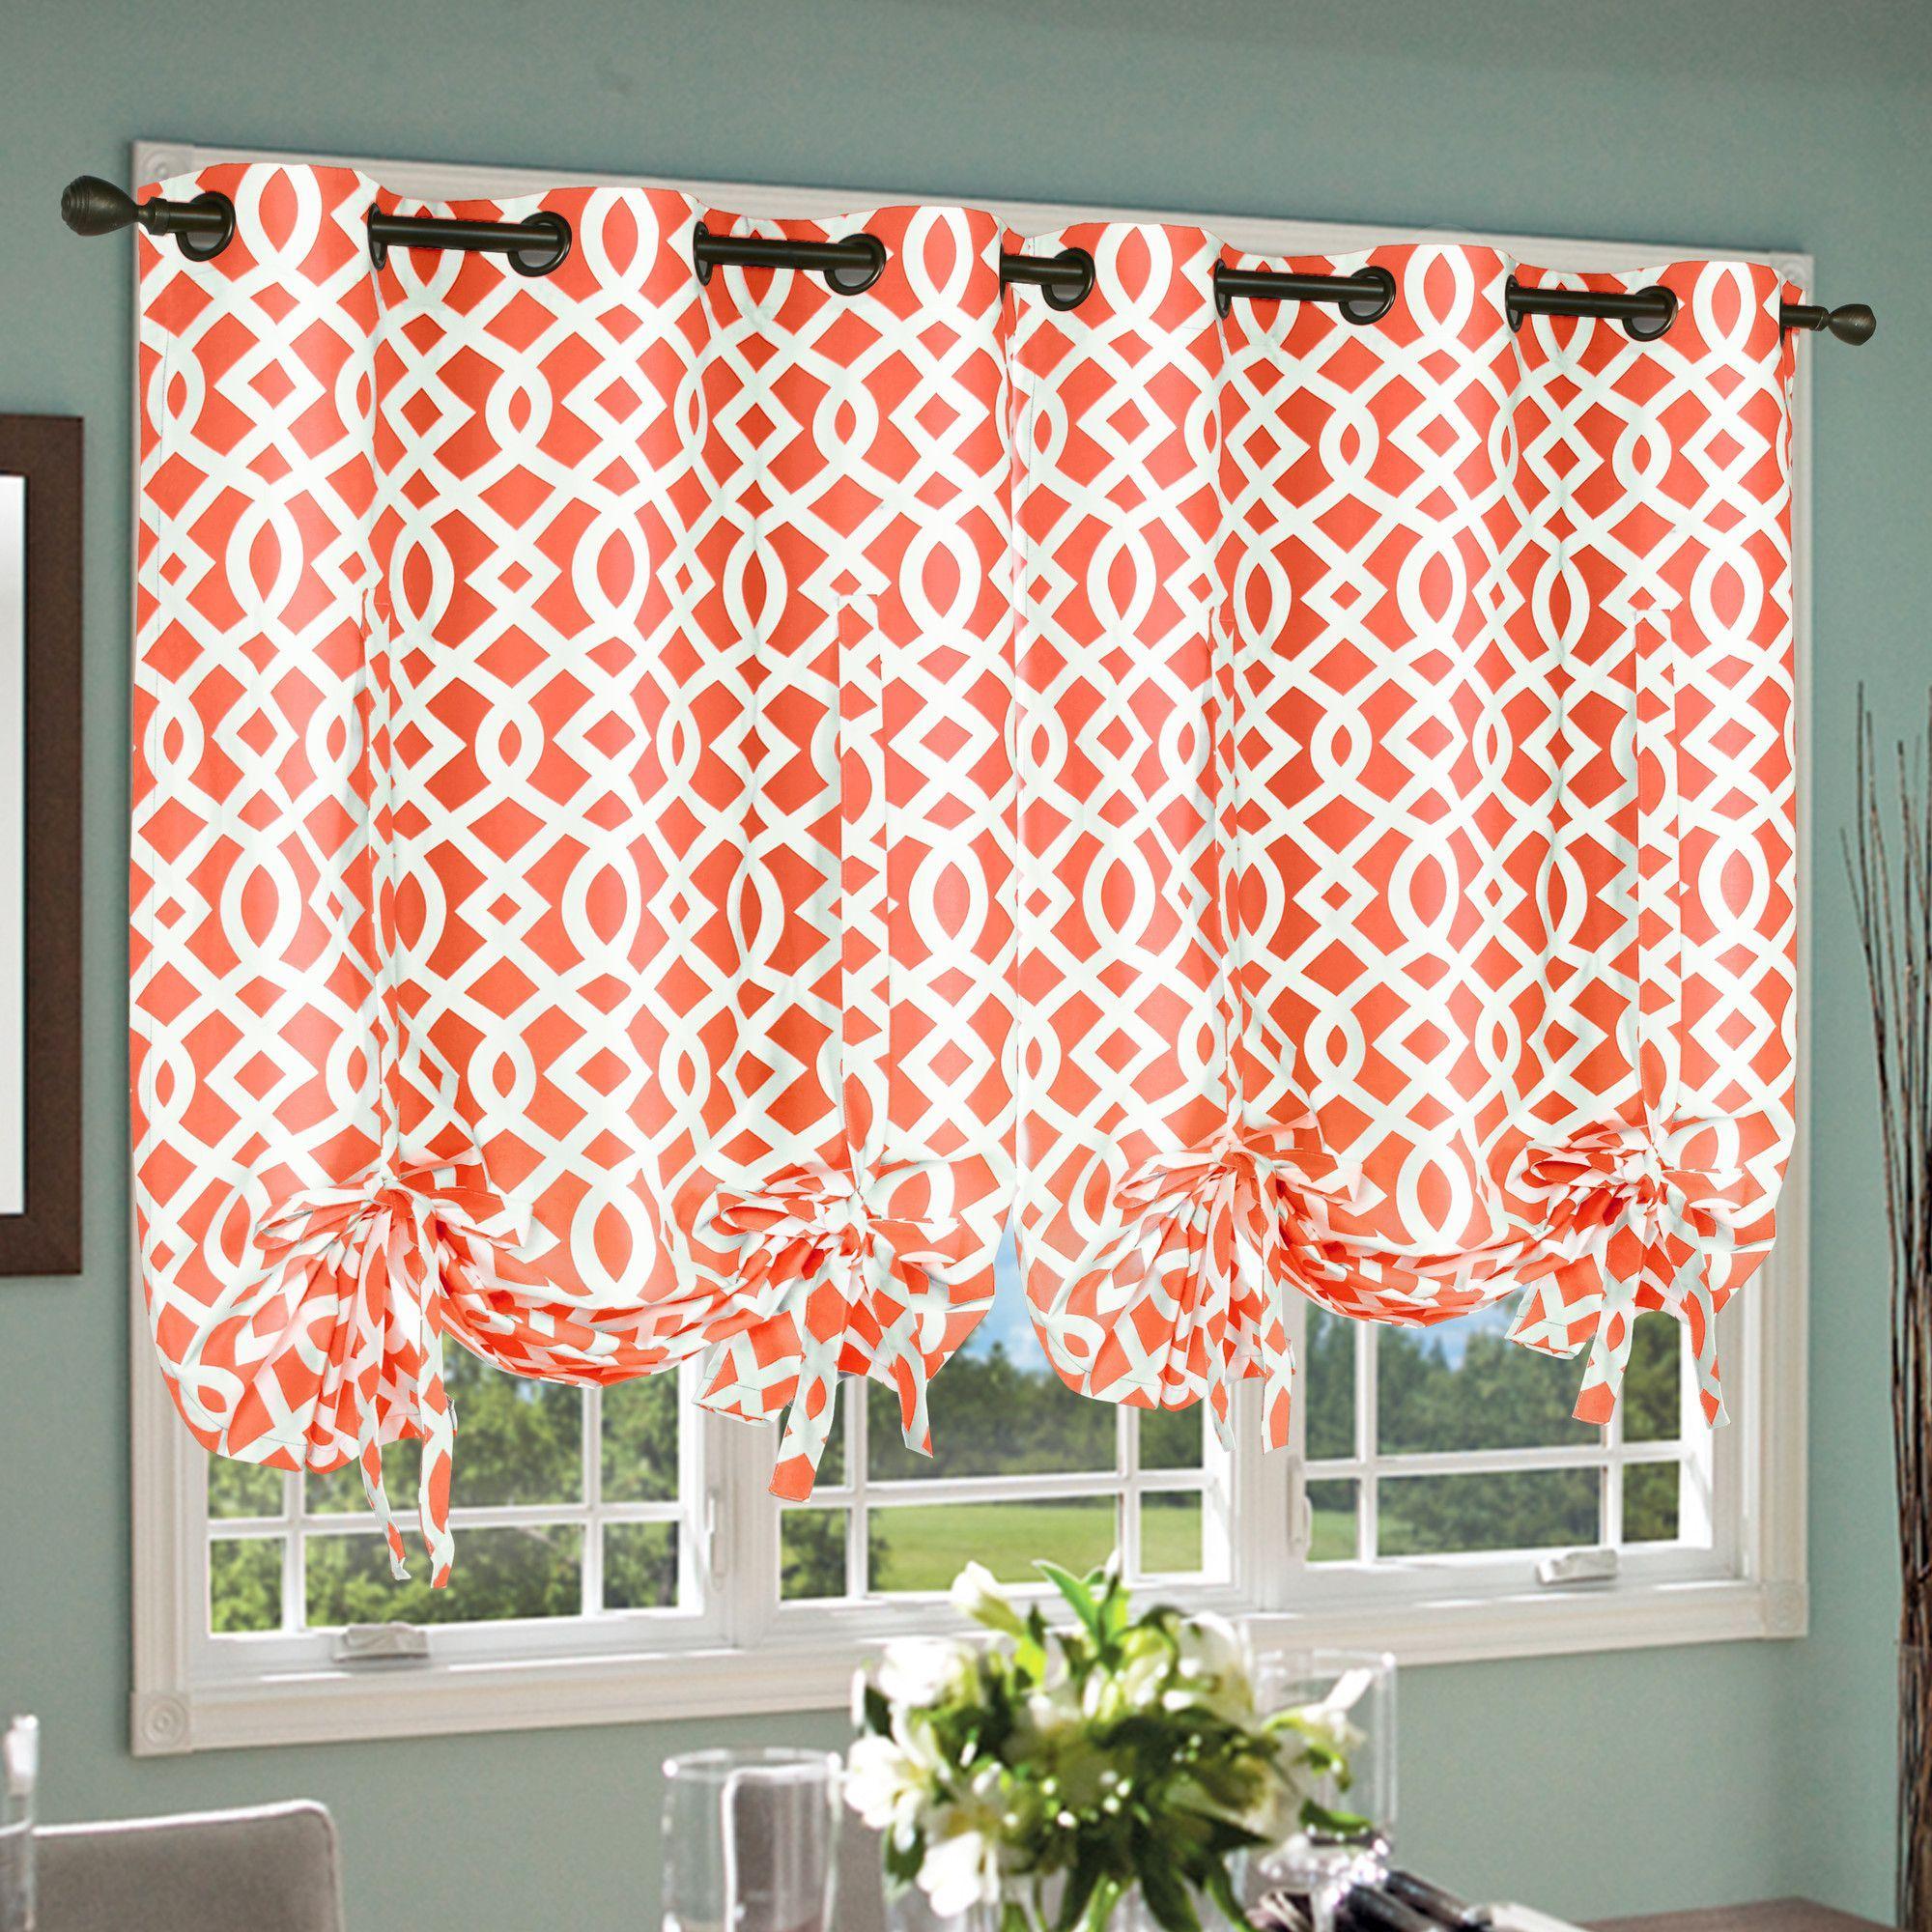 Thermalogic Trellis Tie Up Curtain Single Panel & Reviews Regarding Prescott Insulated Tie Up Window Shade (View 9 of 20)